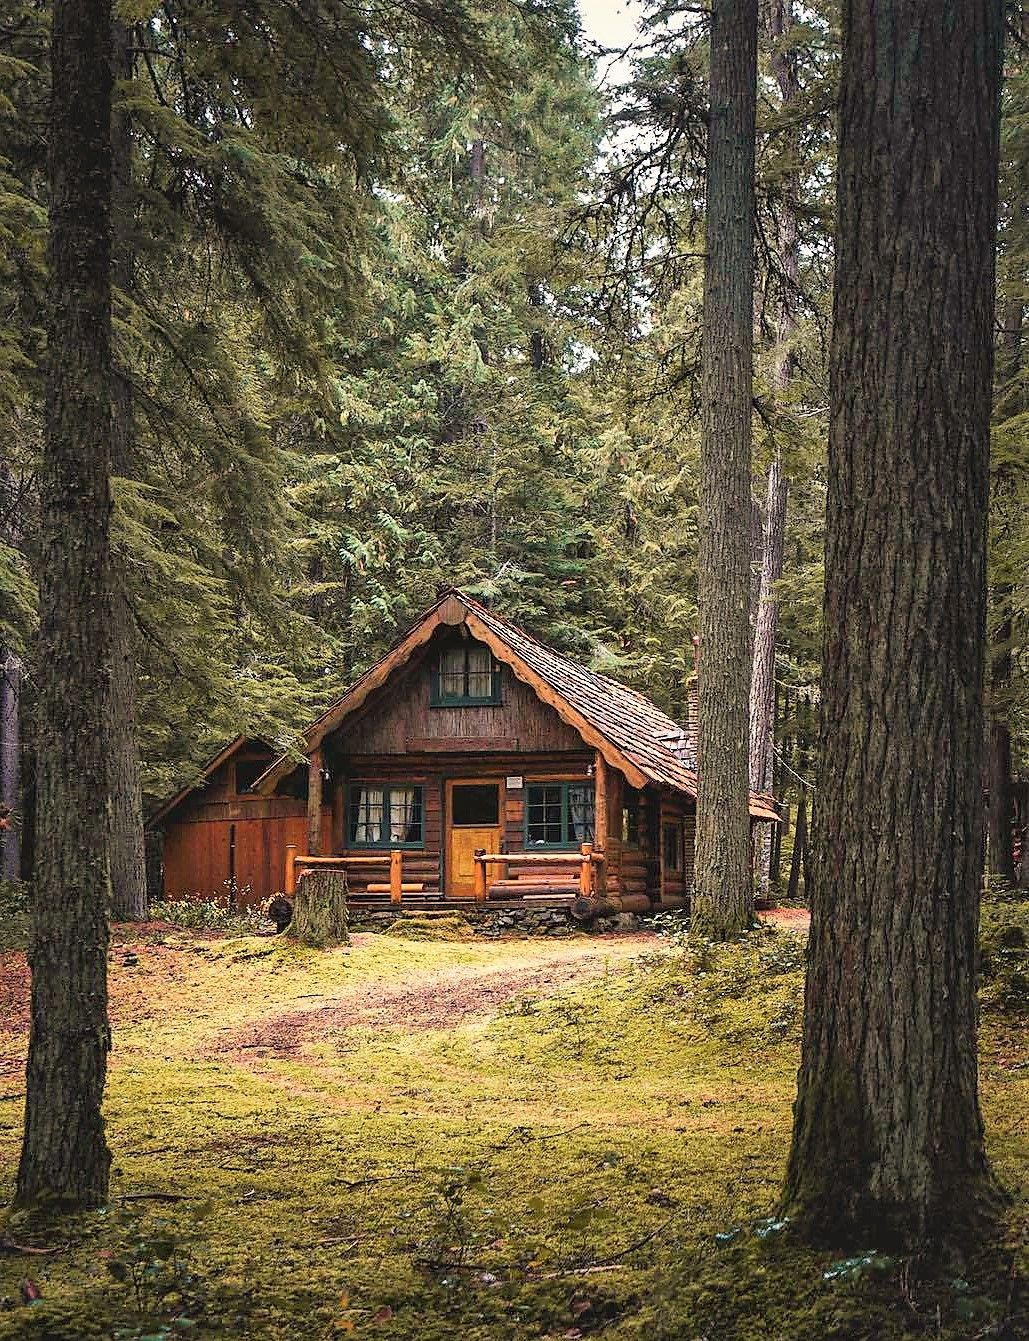 Pin By Zaib Muavia On Cabins In 2020 Log Cabin Homes Cabin Homes Log Homes